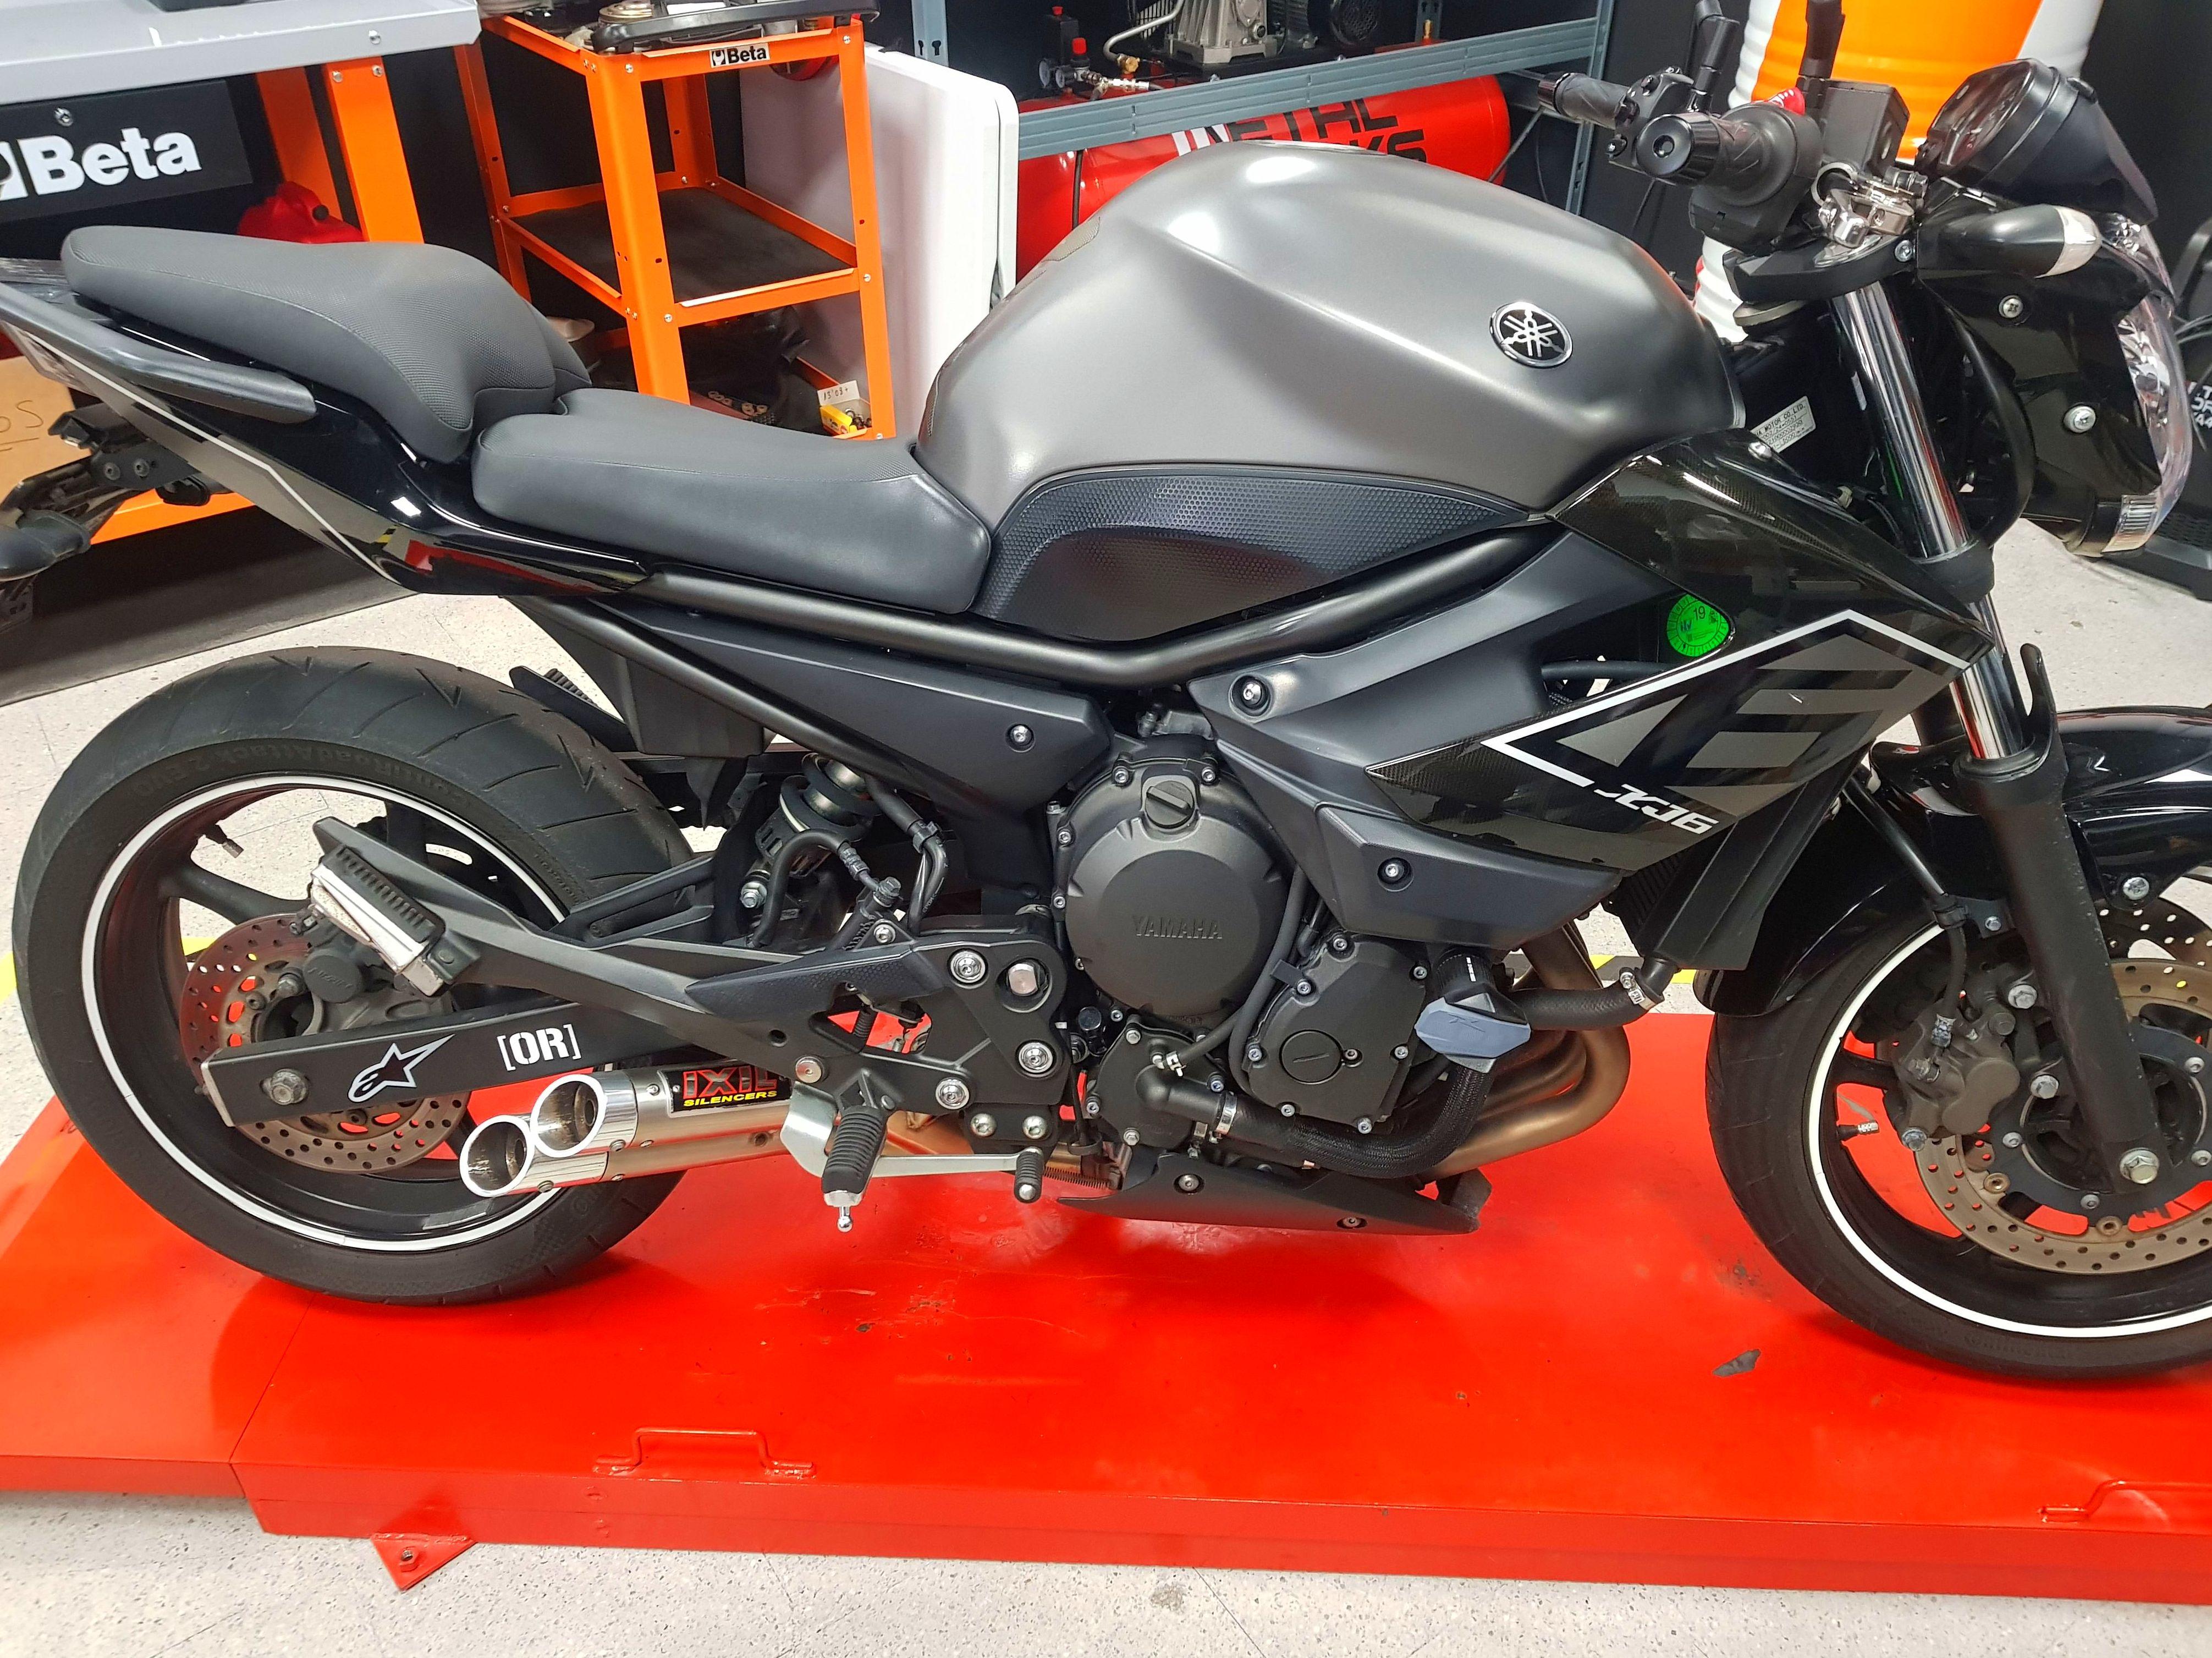 Foto 42 de Taller de motos multimarca en Mataró | Motos Iluro